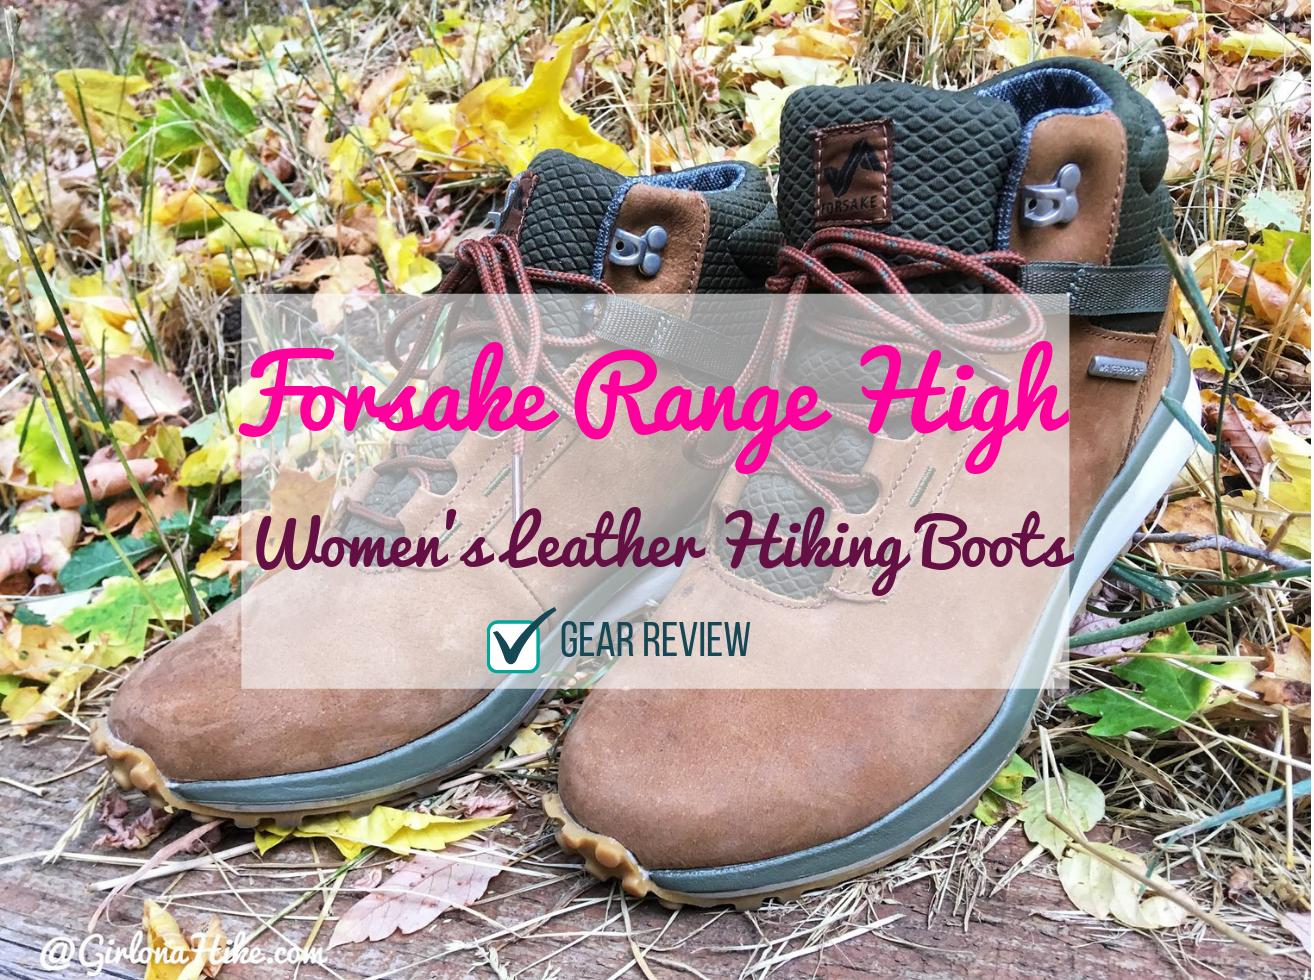 Forsake Range High – Women's Waterproof Leather Hiking Boot